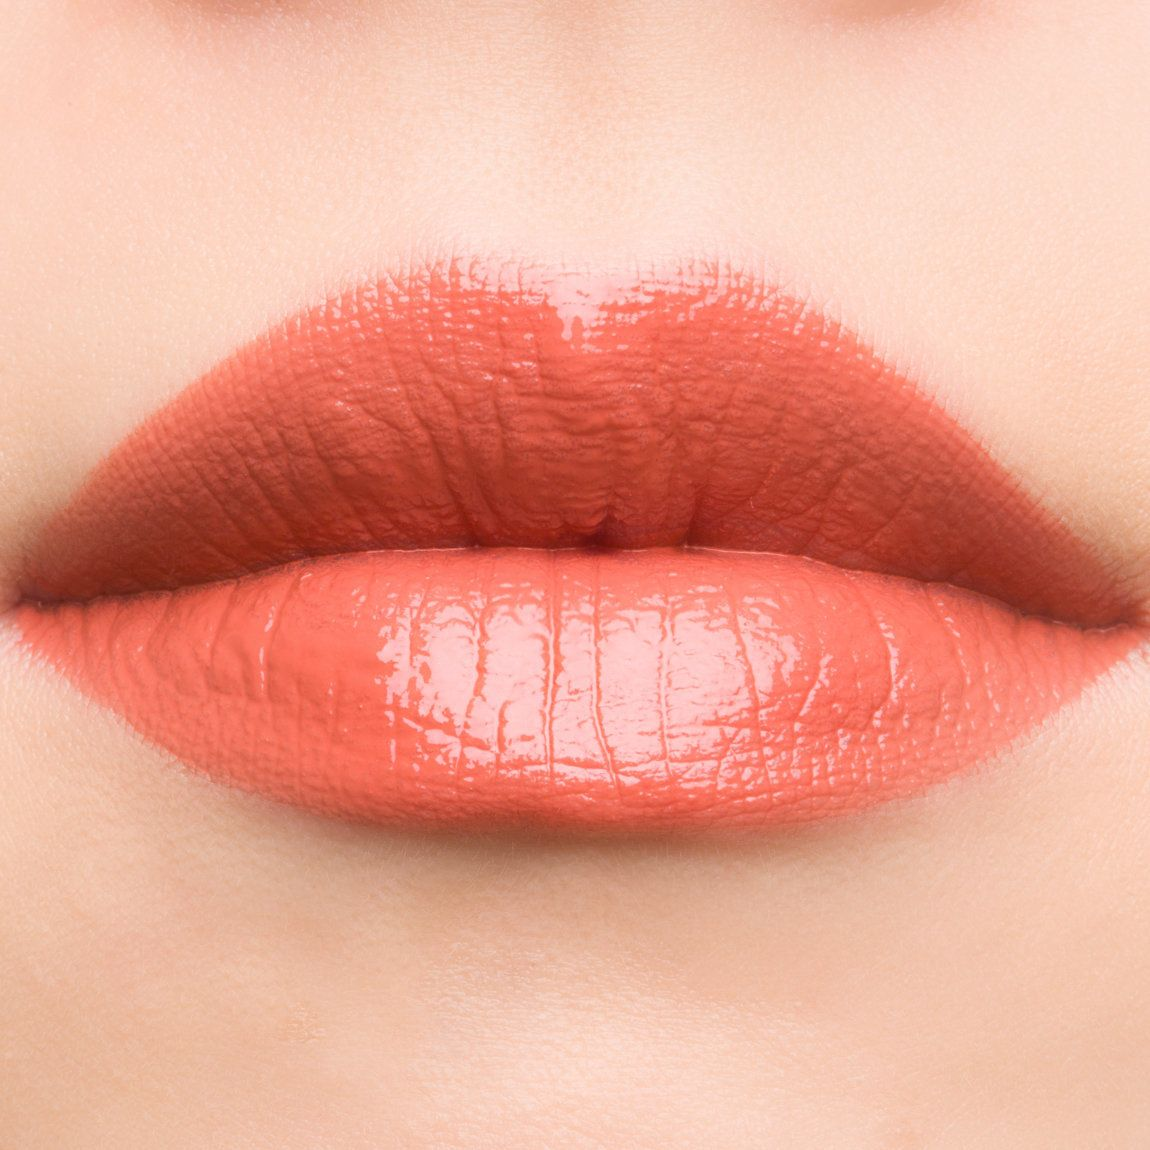 Vision Flush Beauty Skin Care Regimen Beauty Makeup